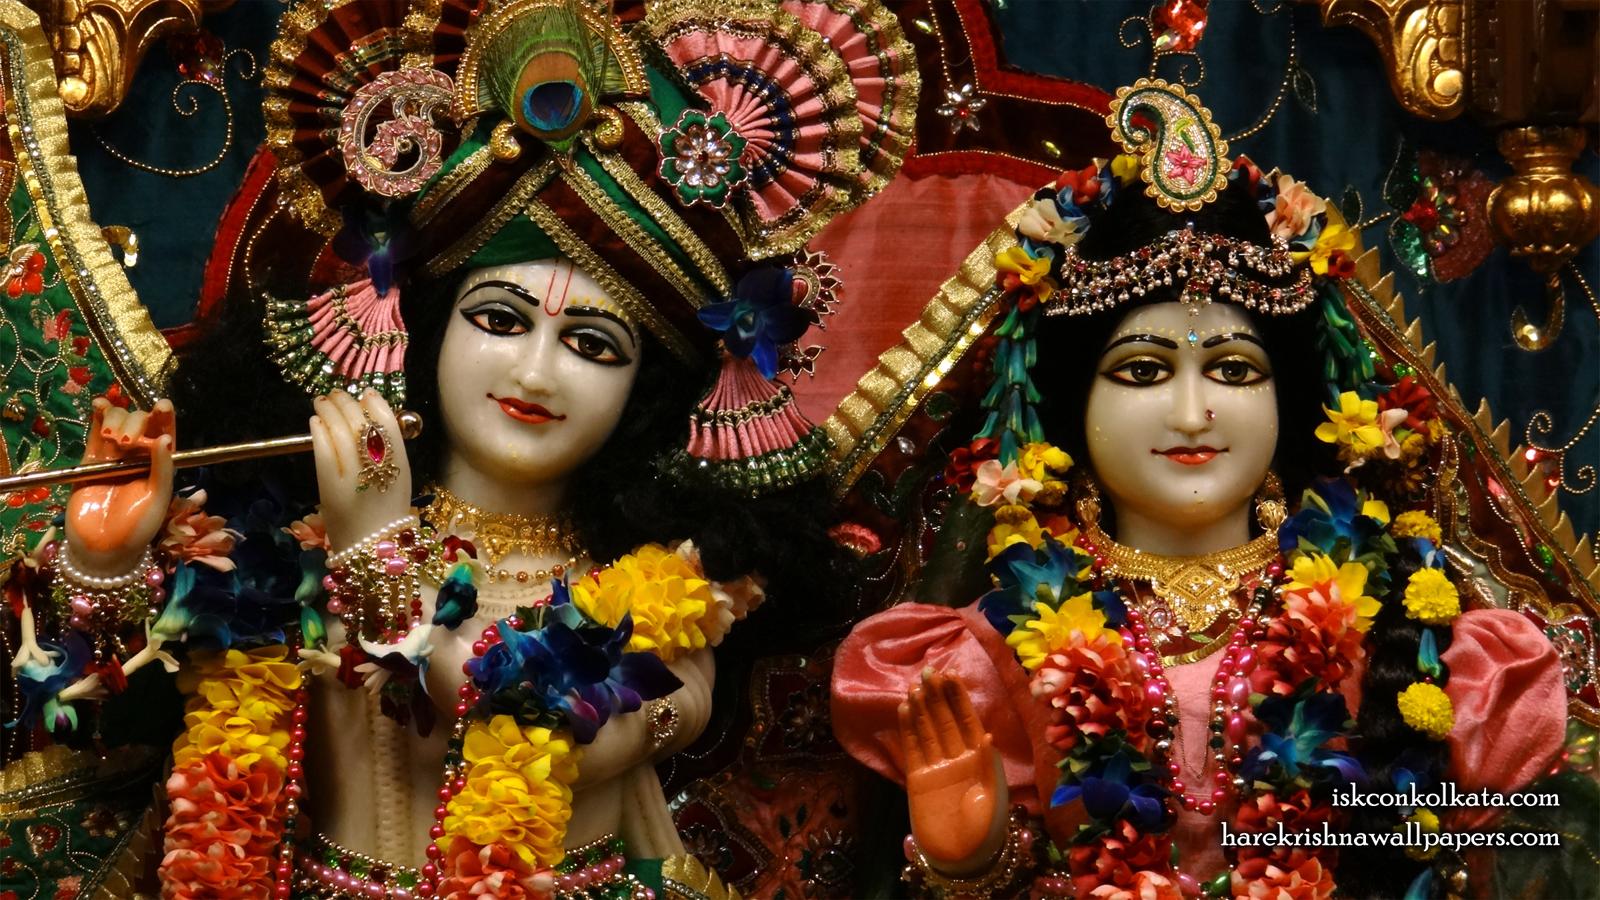 Sri Sri Radha Govinda Close up Wallpaper (010) Size 1600x900 Download